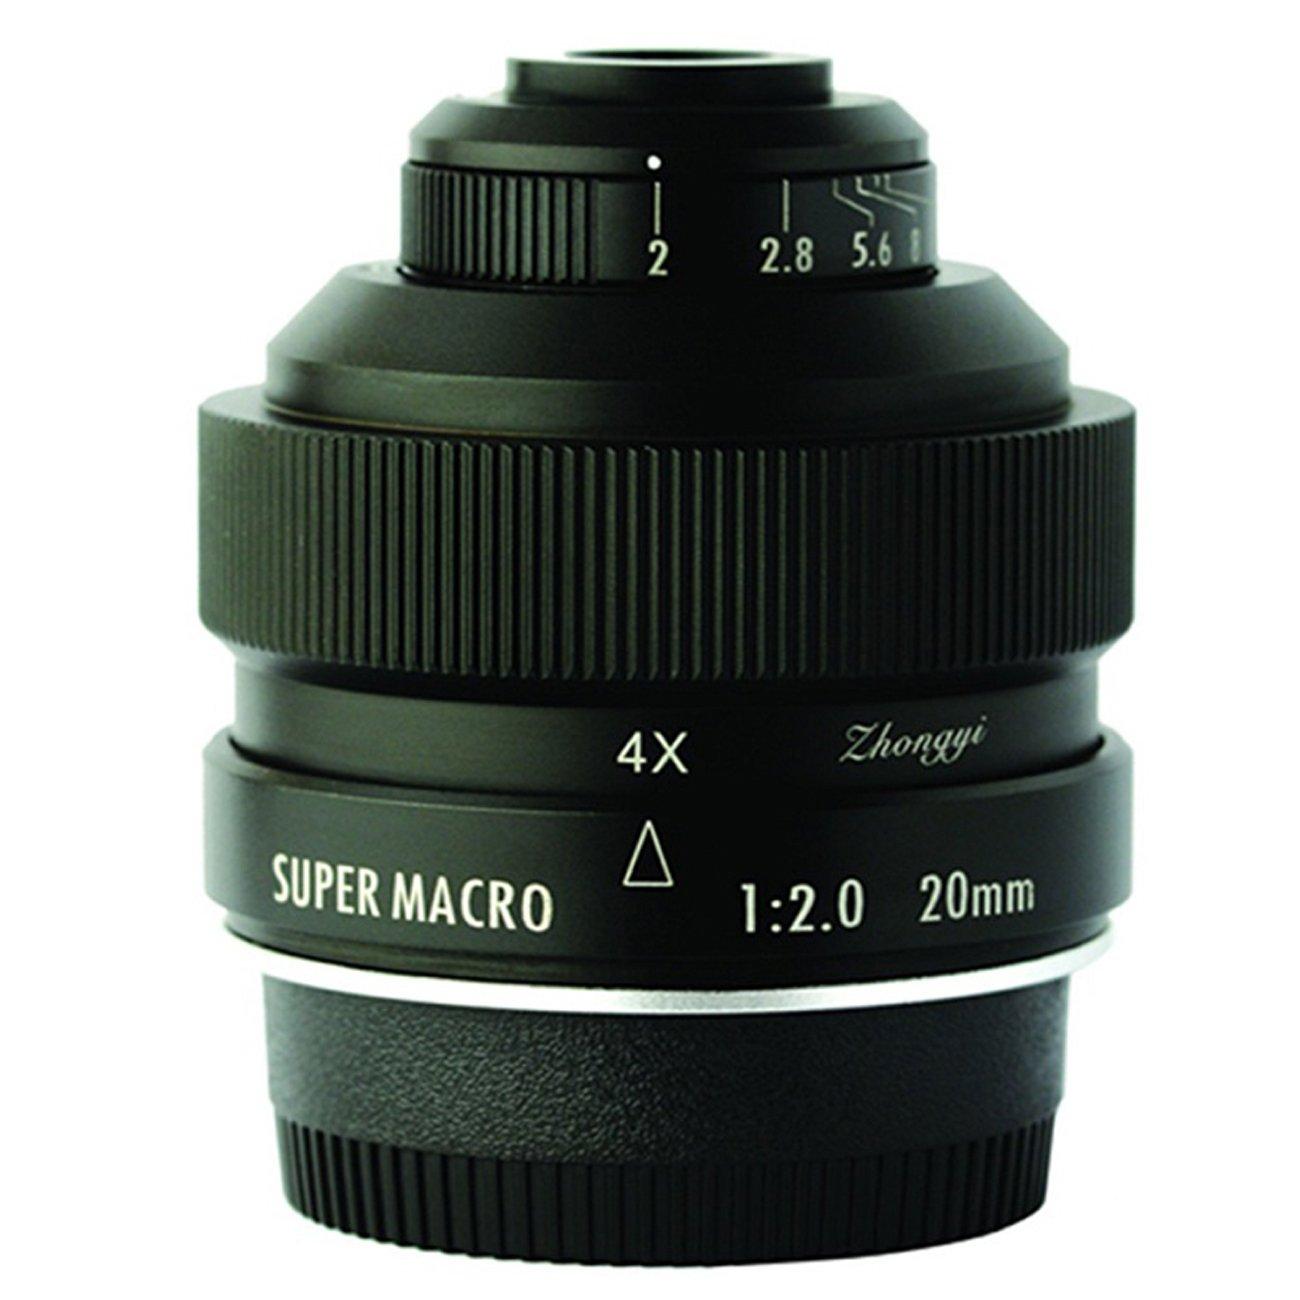 Zhongyi Mitakon 20mm f/2 4.5X Super Macro Lens for Canon EF DSLR Cameras 5D3 5D4 80D 6D2 1D 6D 1DX MarKII